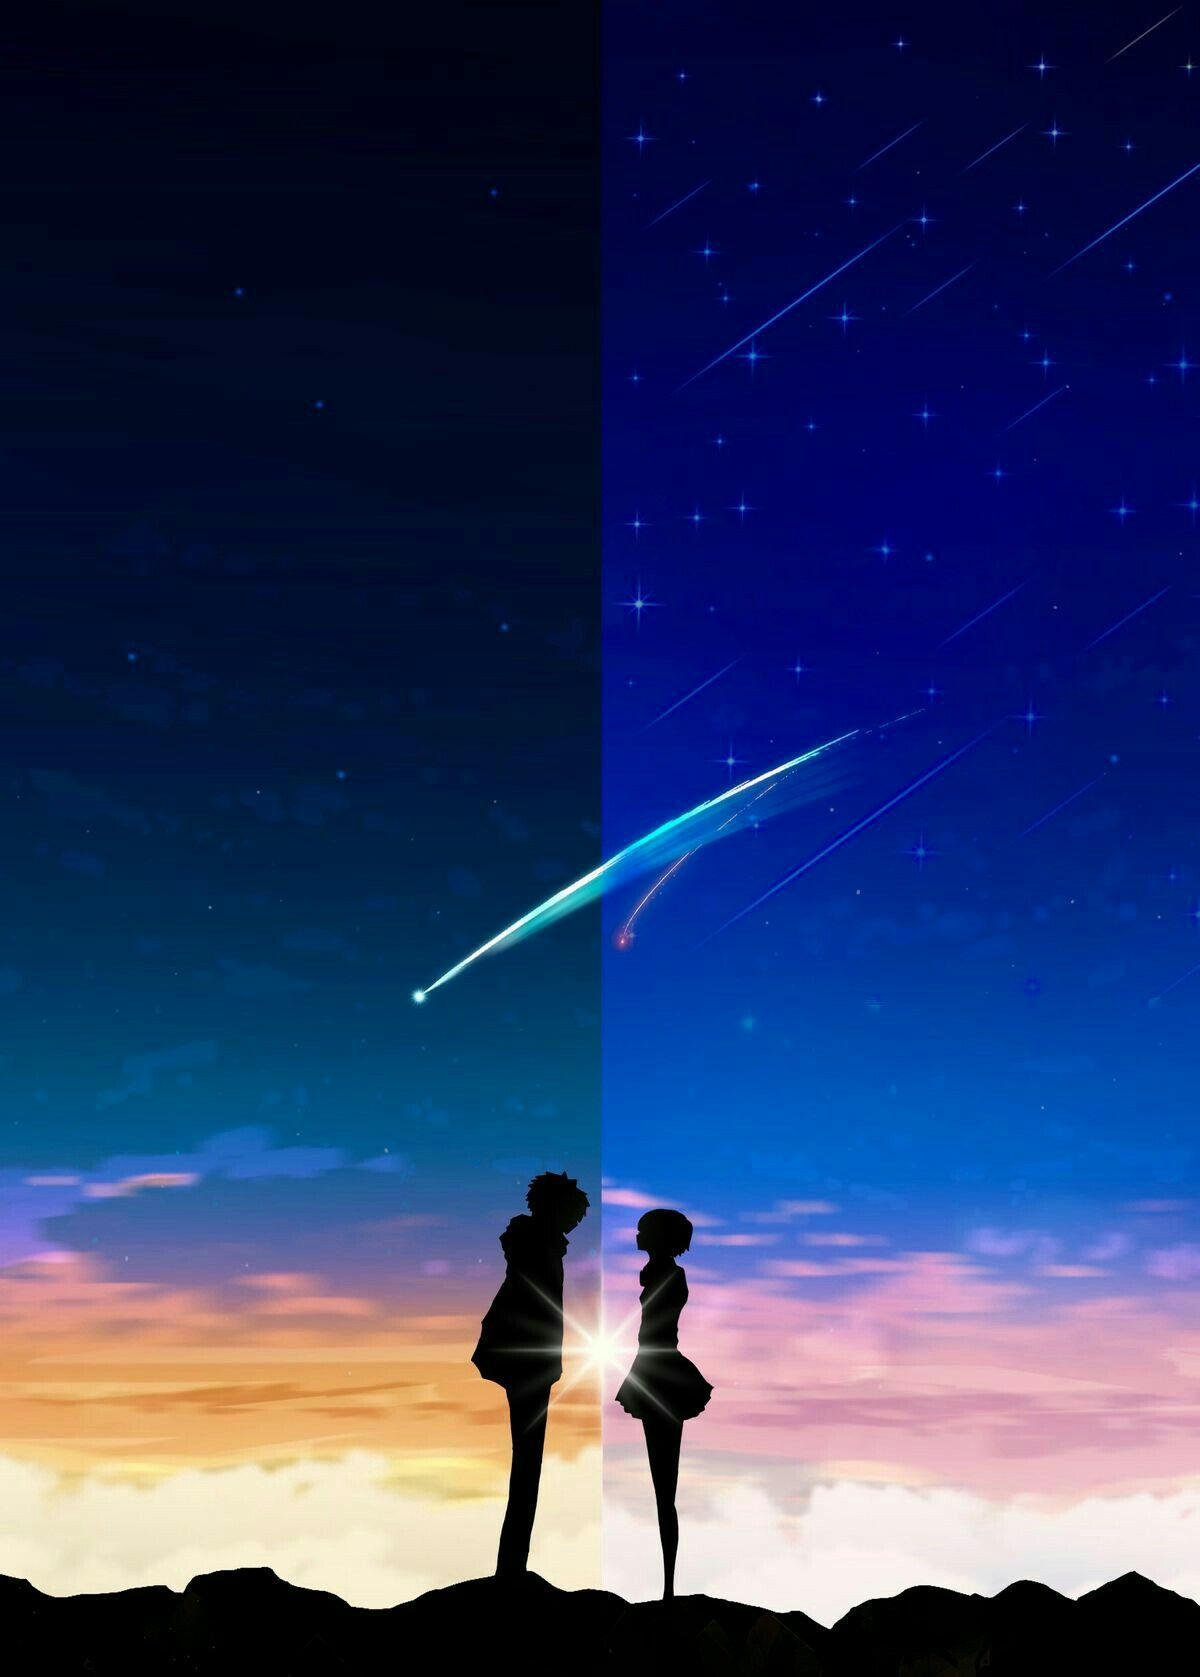 Pin By Paula On Couples Your Name Anime Kimi No Na Wa Anime Galaxy Anime galaxy wallpaper couple